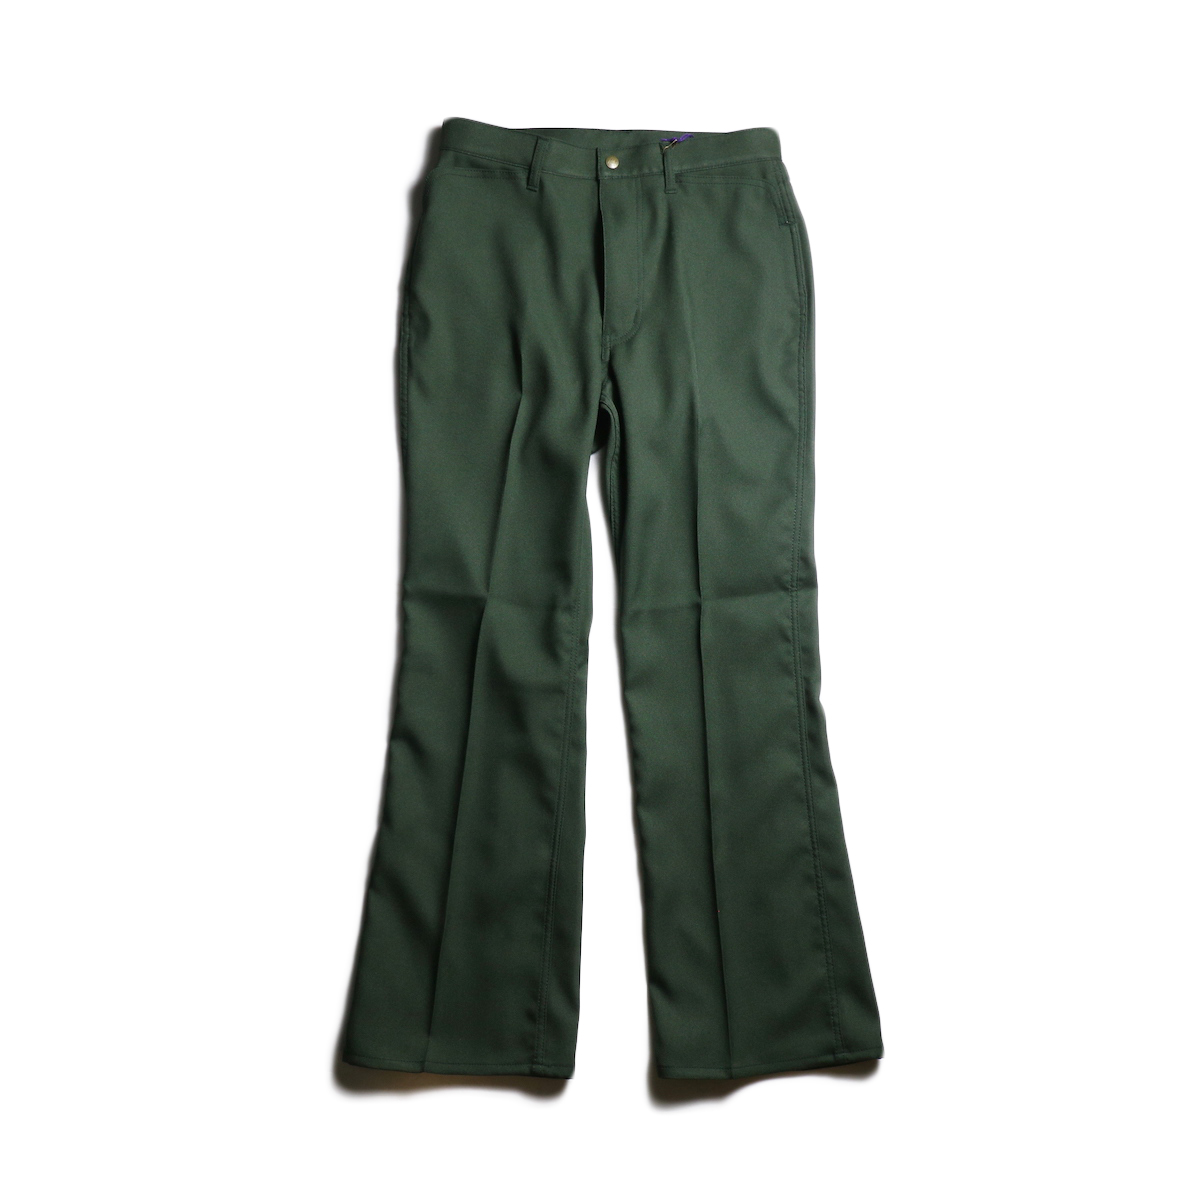 Needles / BOOT-CUT JEAN - POLY TWILL (Green)